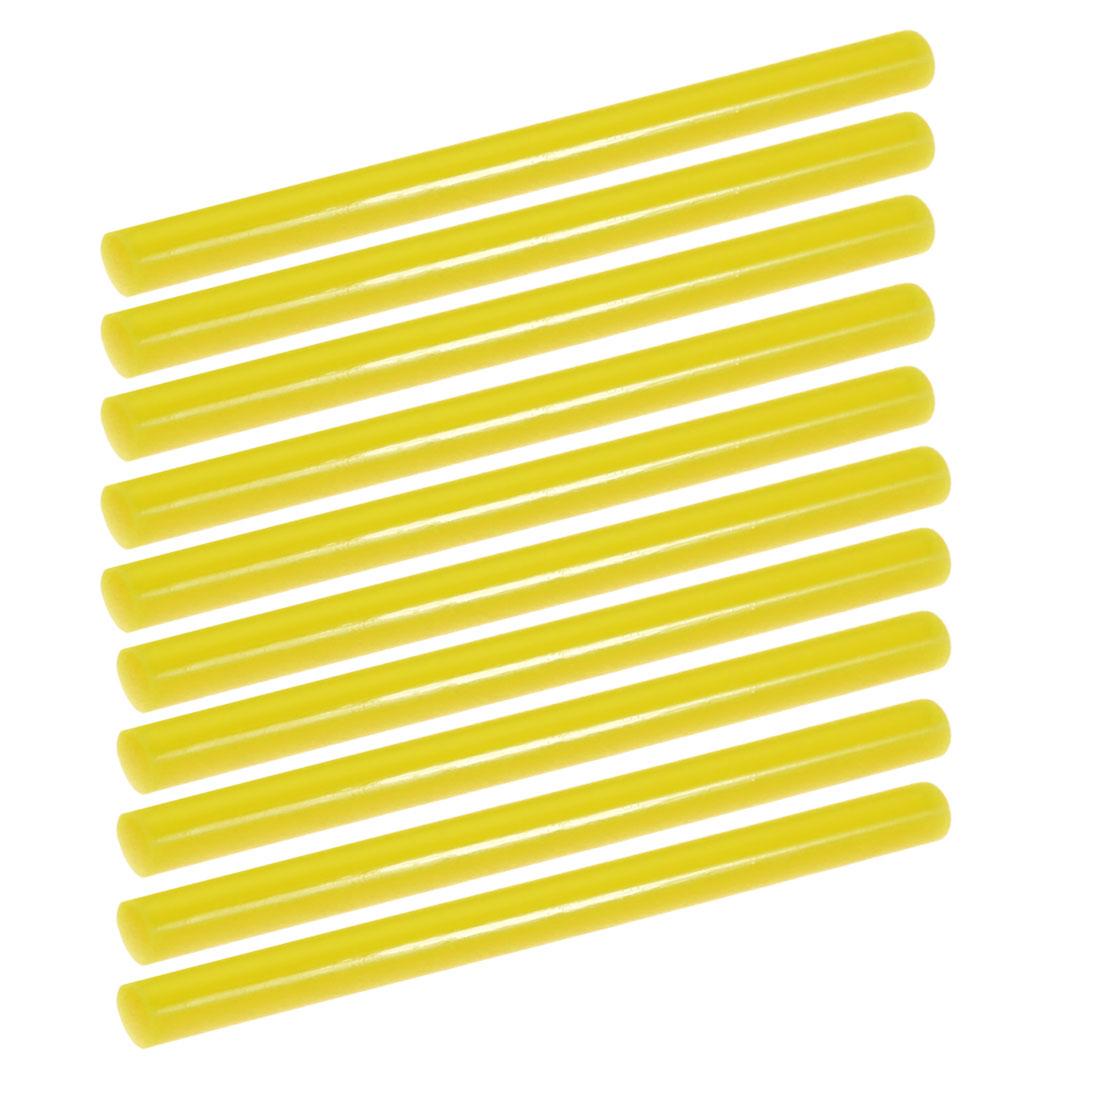 10pcs 7mm Dia 100mm Long Hot Melt Glue Adhesive Stick Yellow